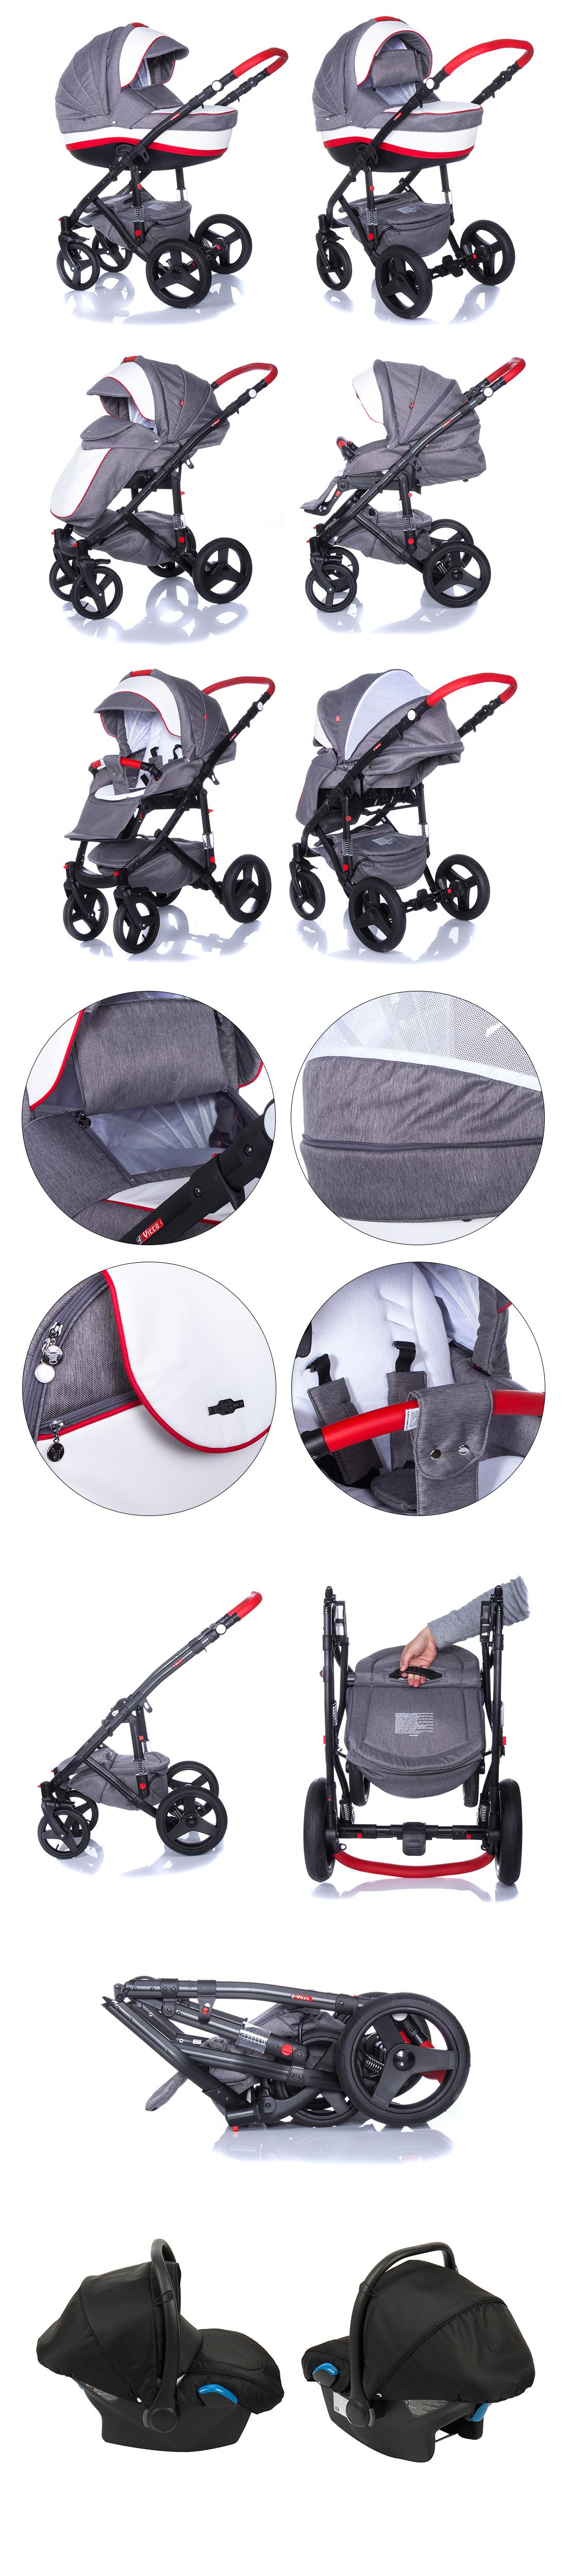 Baby Pram Pushchair Stroller Buggy Travel System 2in1 3in1